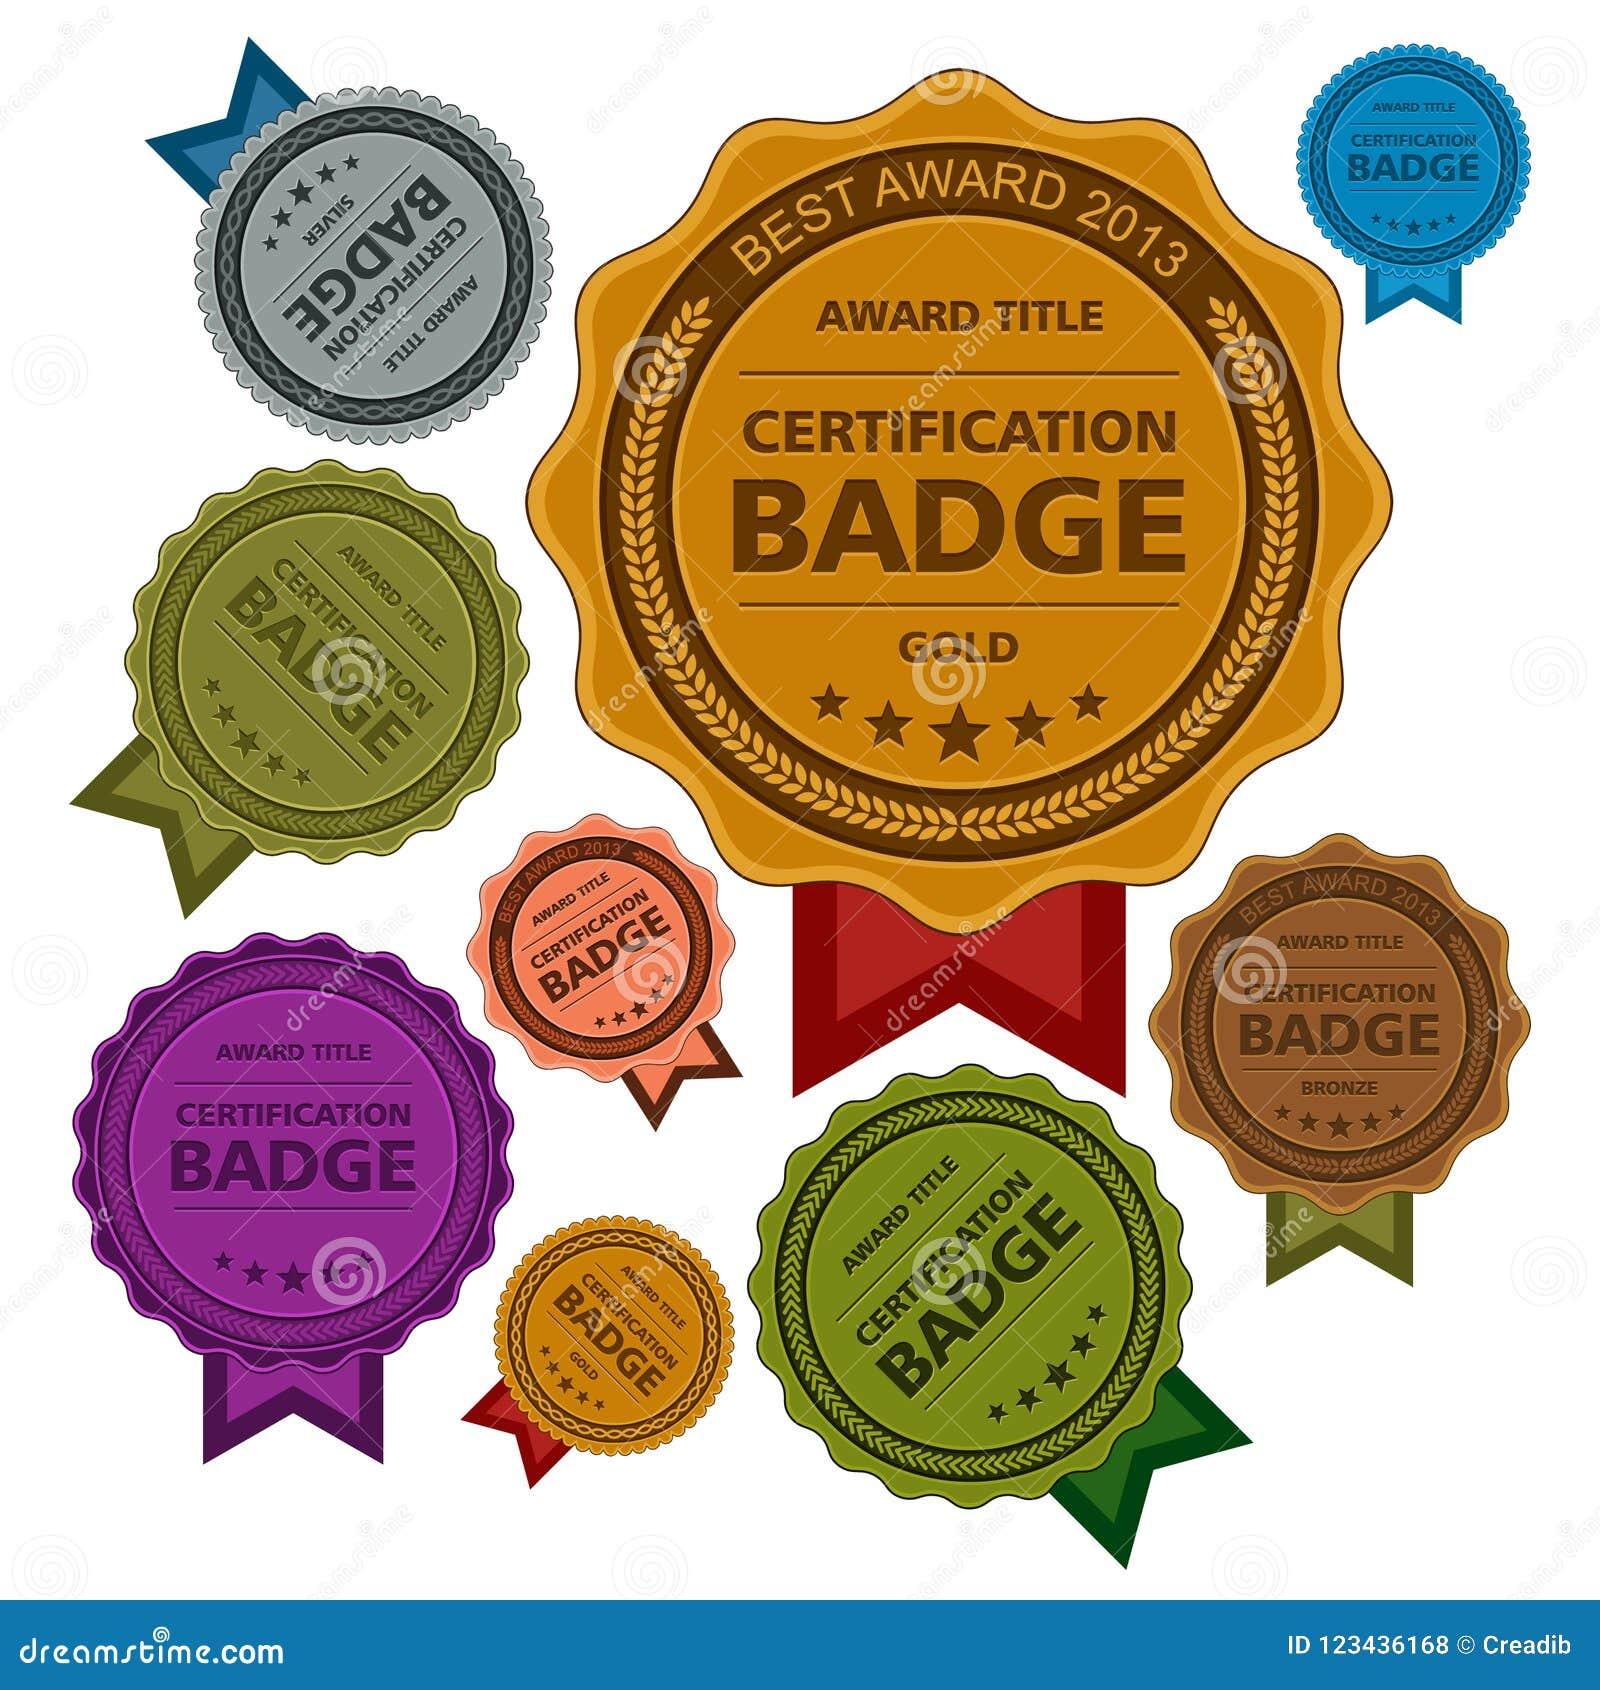 Colored Awards Badges Certification Badges Template Design Stock